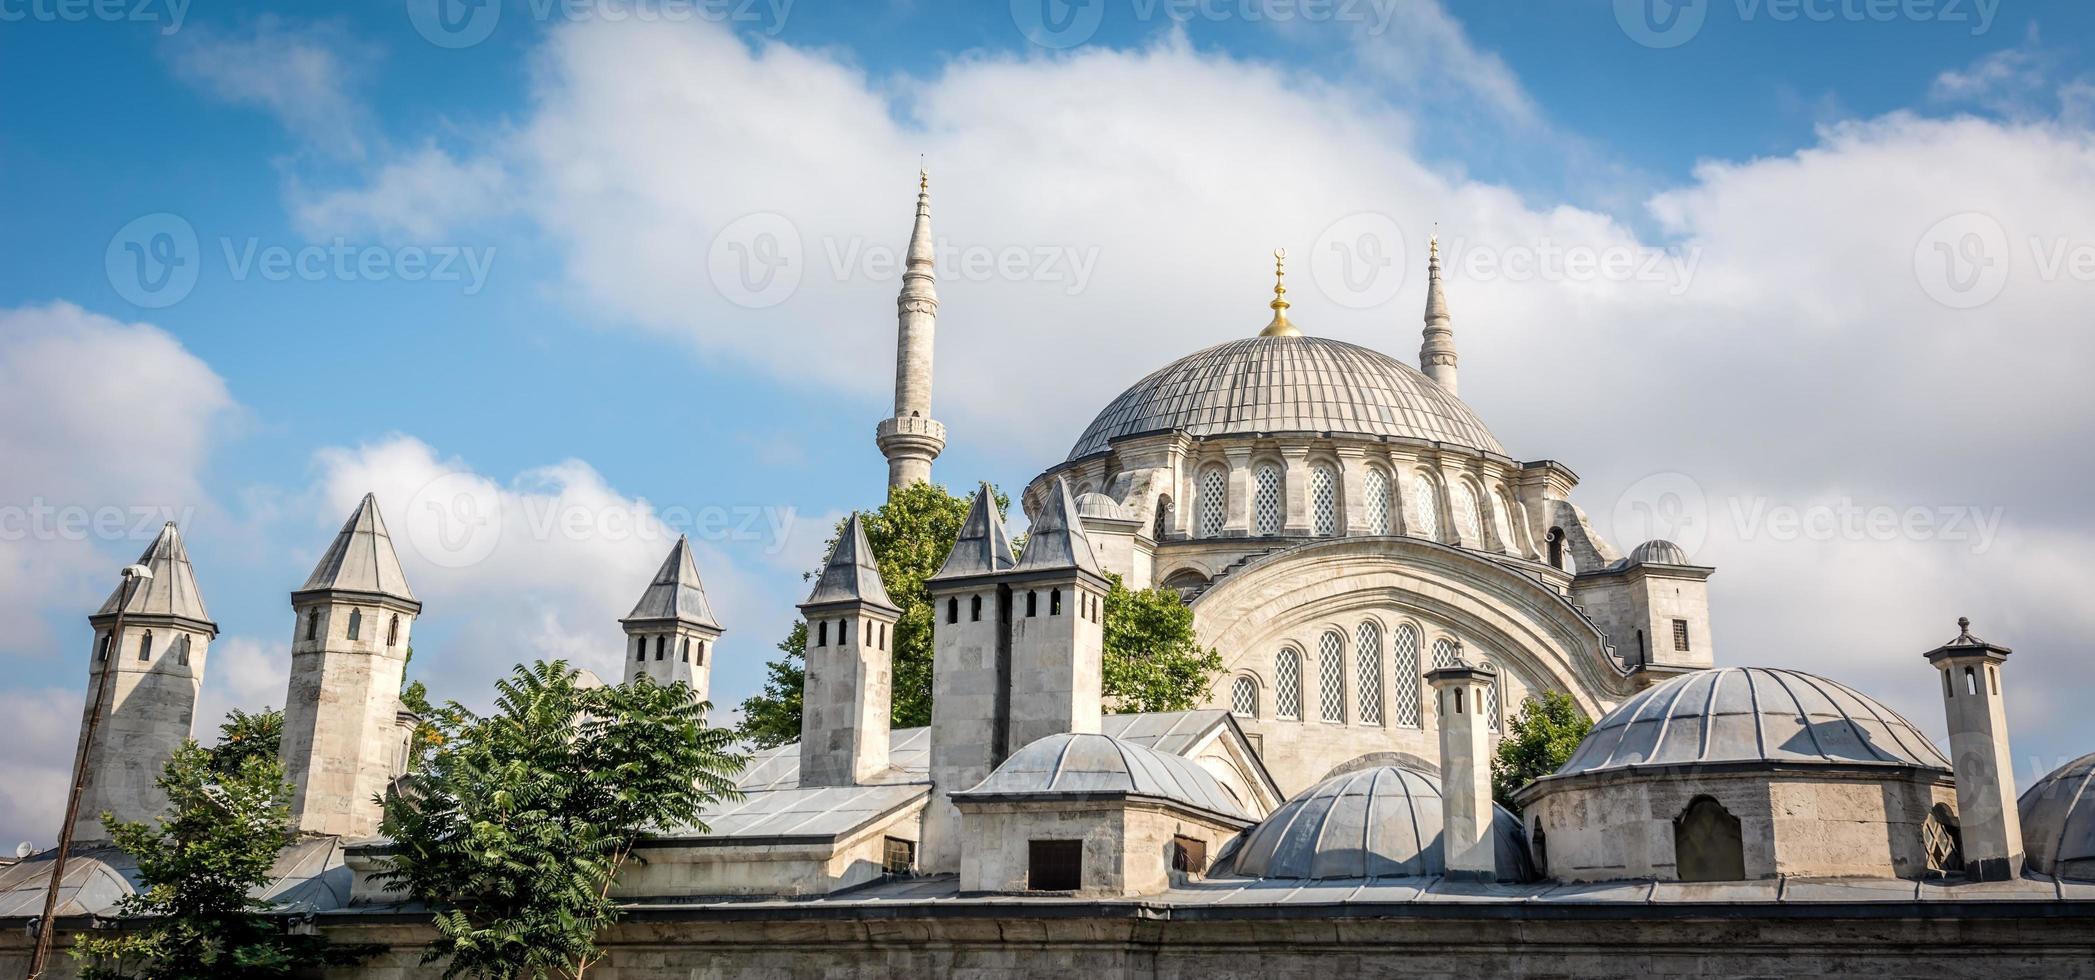 nuruosmaniye moskee in istanbul, turkije foto